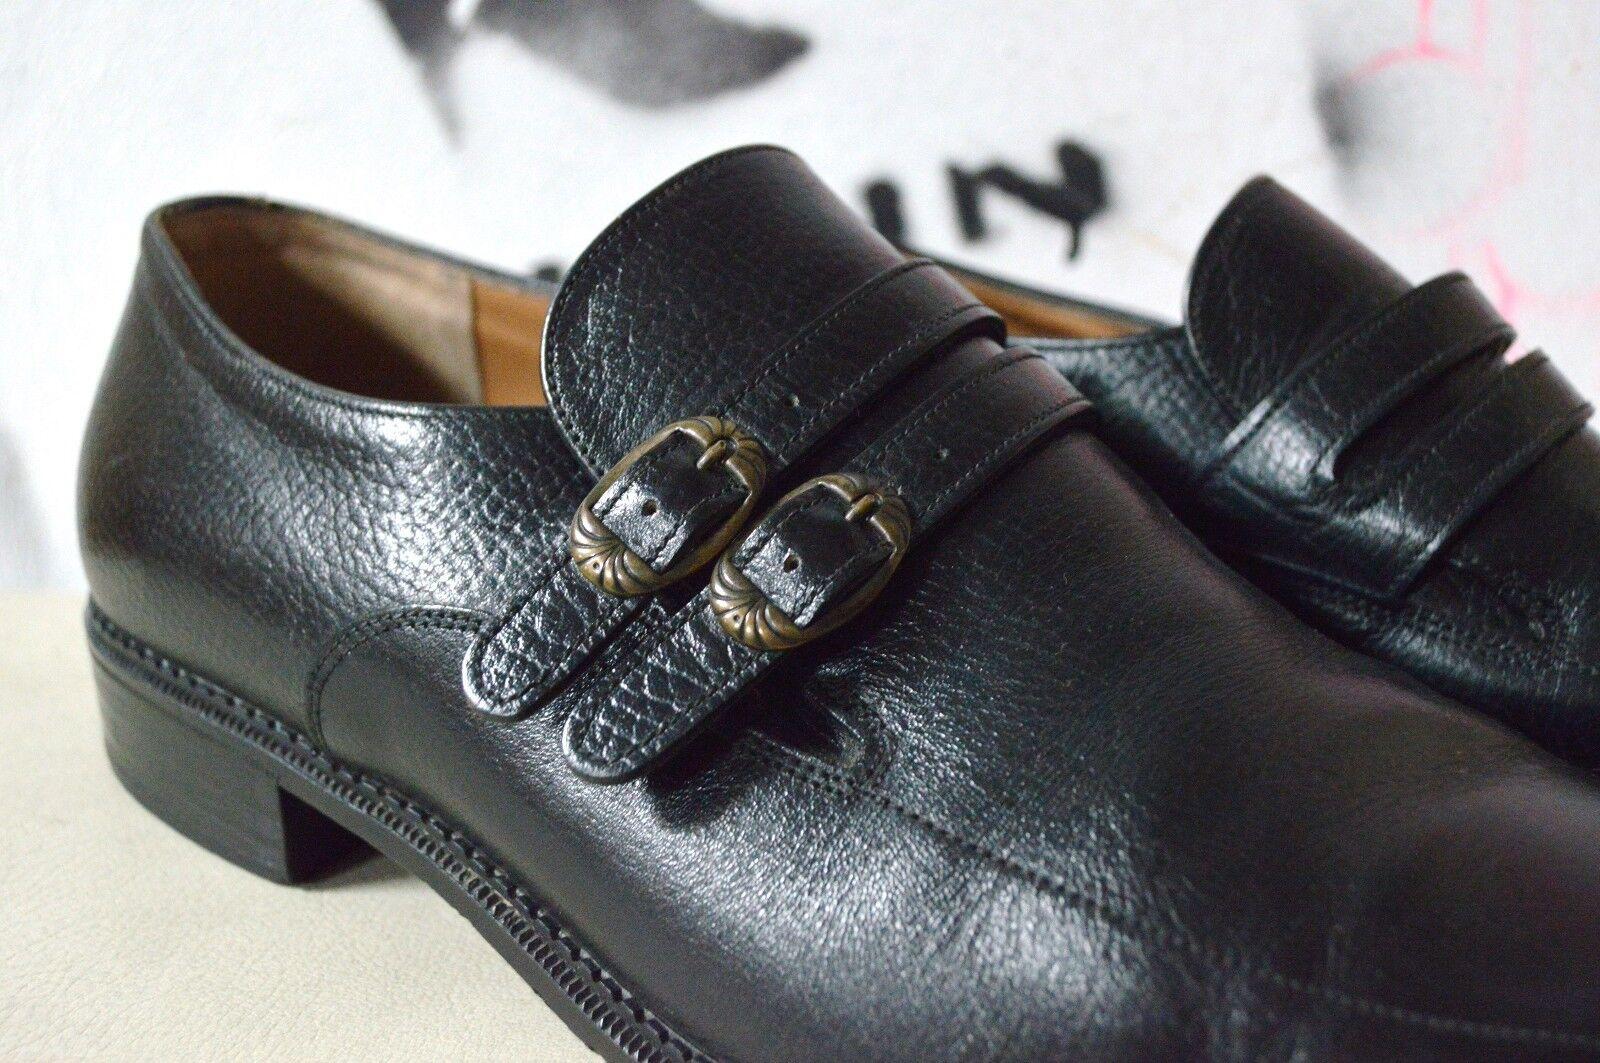 Uomo MOCASSINI FRANCESINE Vintage Fibbie Scarpe 41 True Vintage FRANCESINE loafer Nero 3681b4